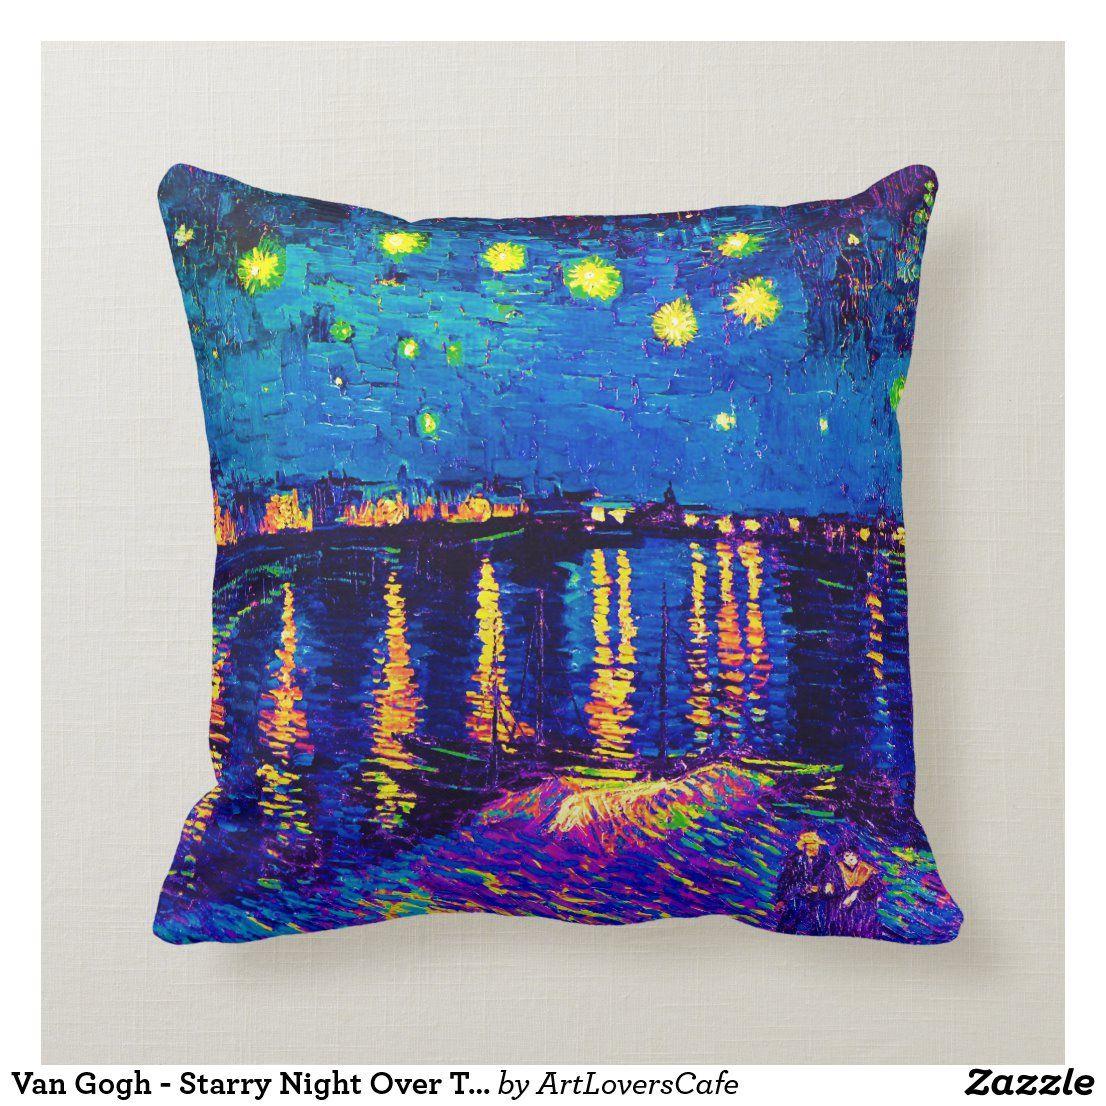 Van Gogh – Starry Night Over The Rhone Pop Art Throw Pillow For Recent Blended Fabric Van Gogh Starry Night Over The Rhone Wall Hangings (View 9 of 20)